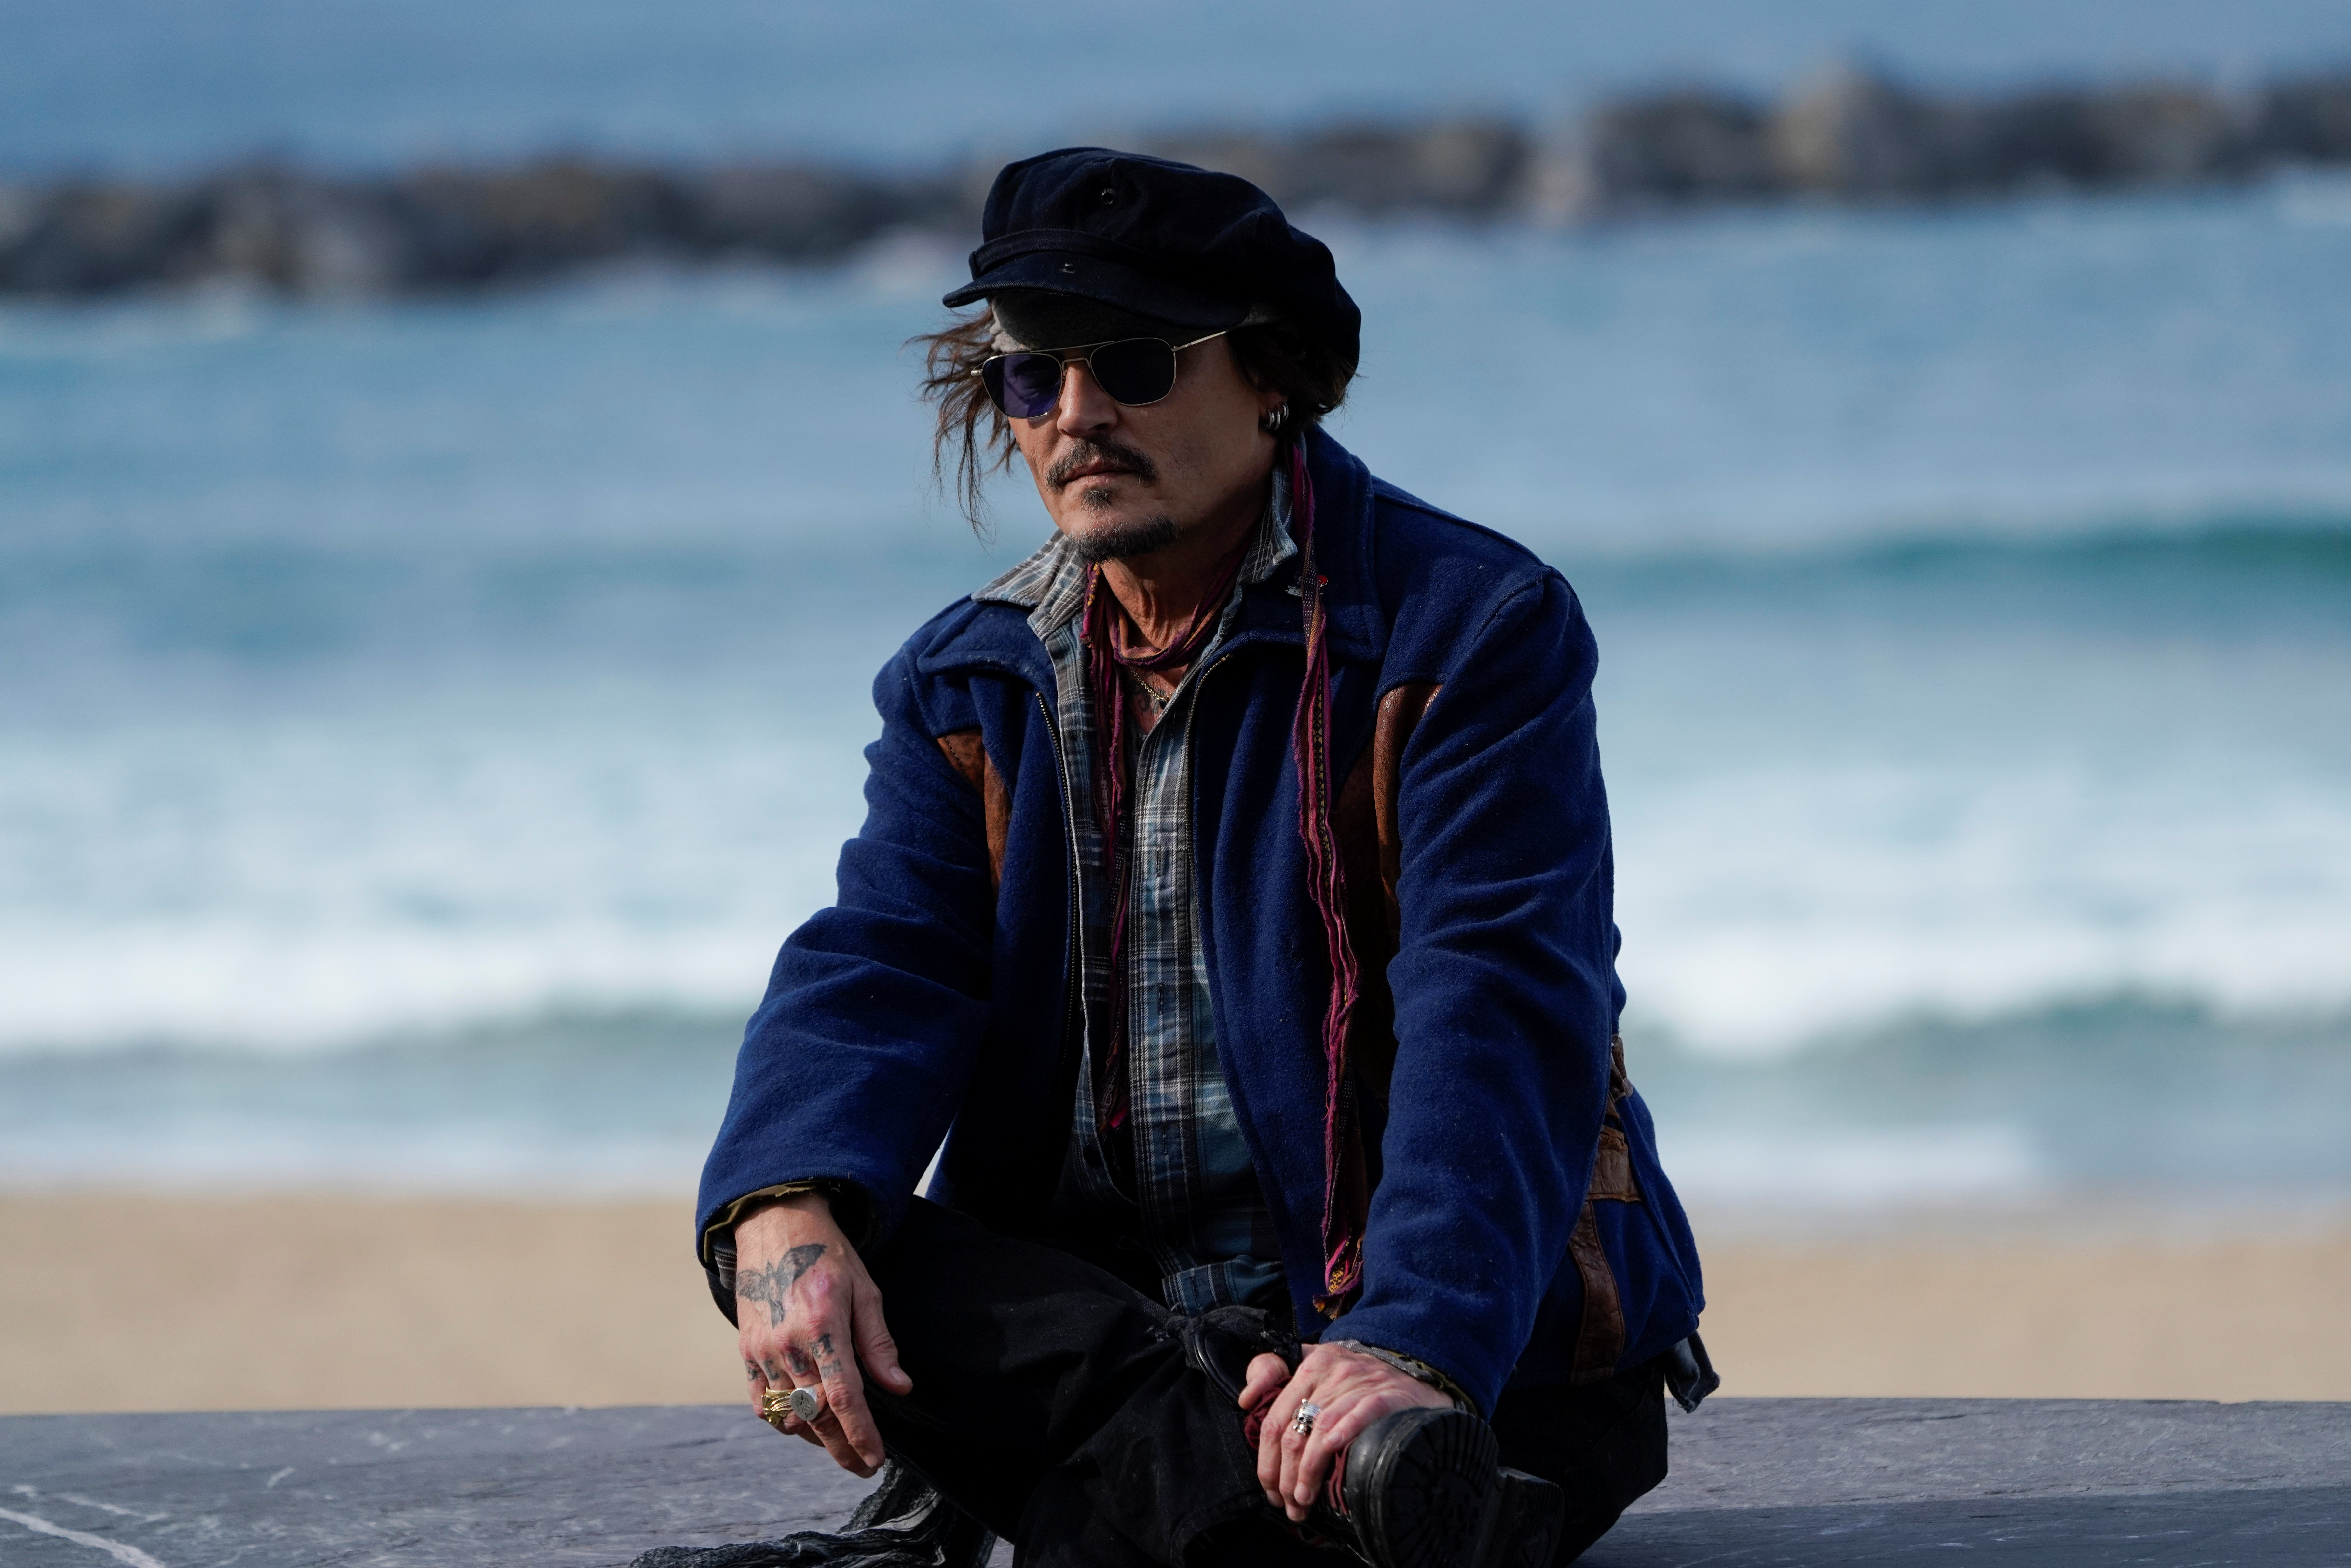 Actor Johnny Depp attends a photocall ahead of receiving the Donostia Award at the 69th San Sebastian International Film Festival, in San Sebastian, Spain, September 22, 2021. REUTERS/Vincent West